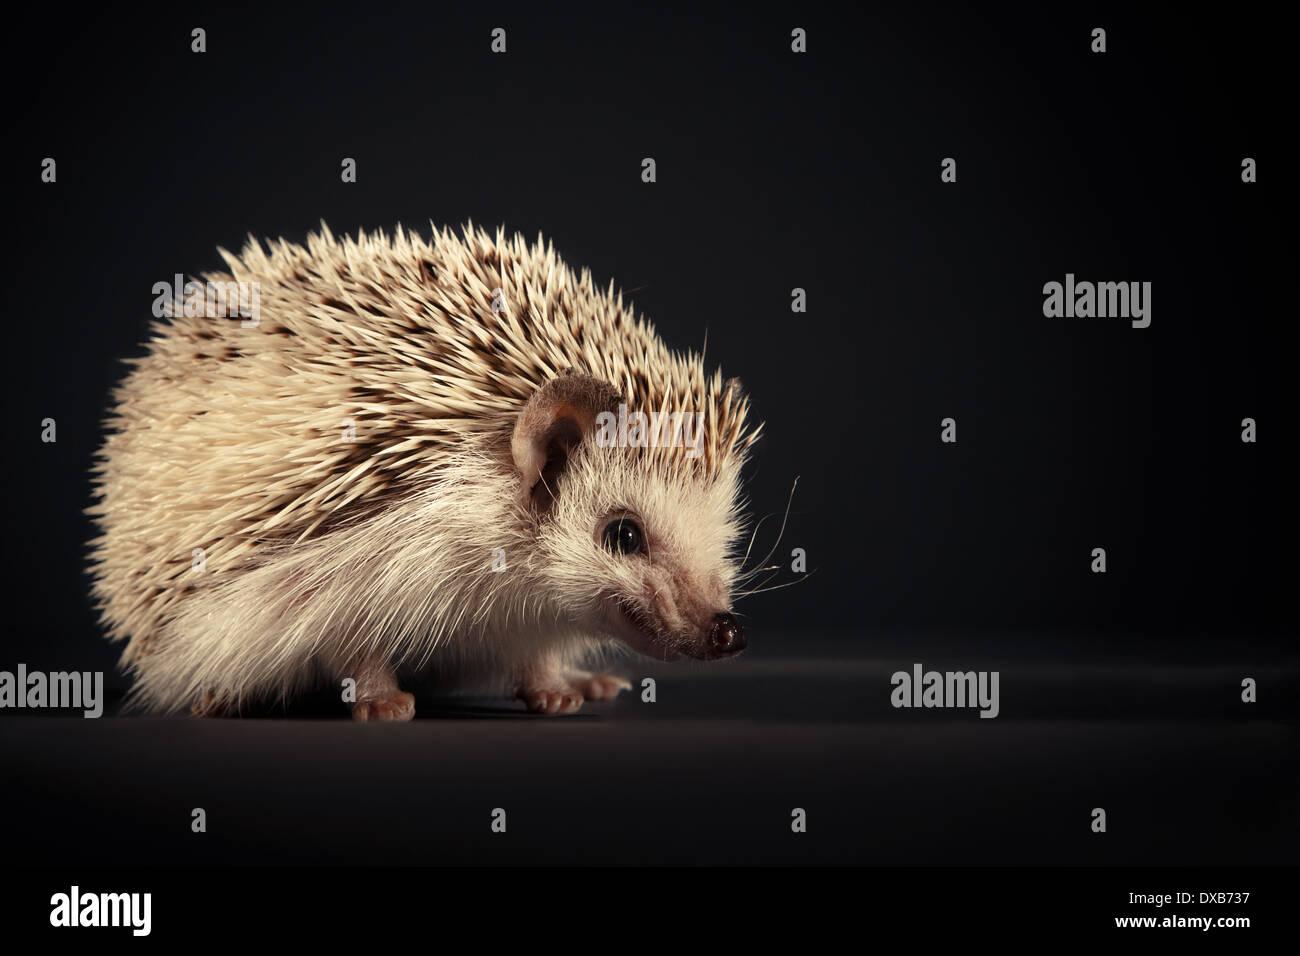 Hedgehog baring teeth to camera. - Stock Image